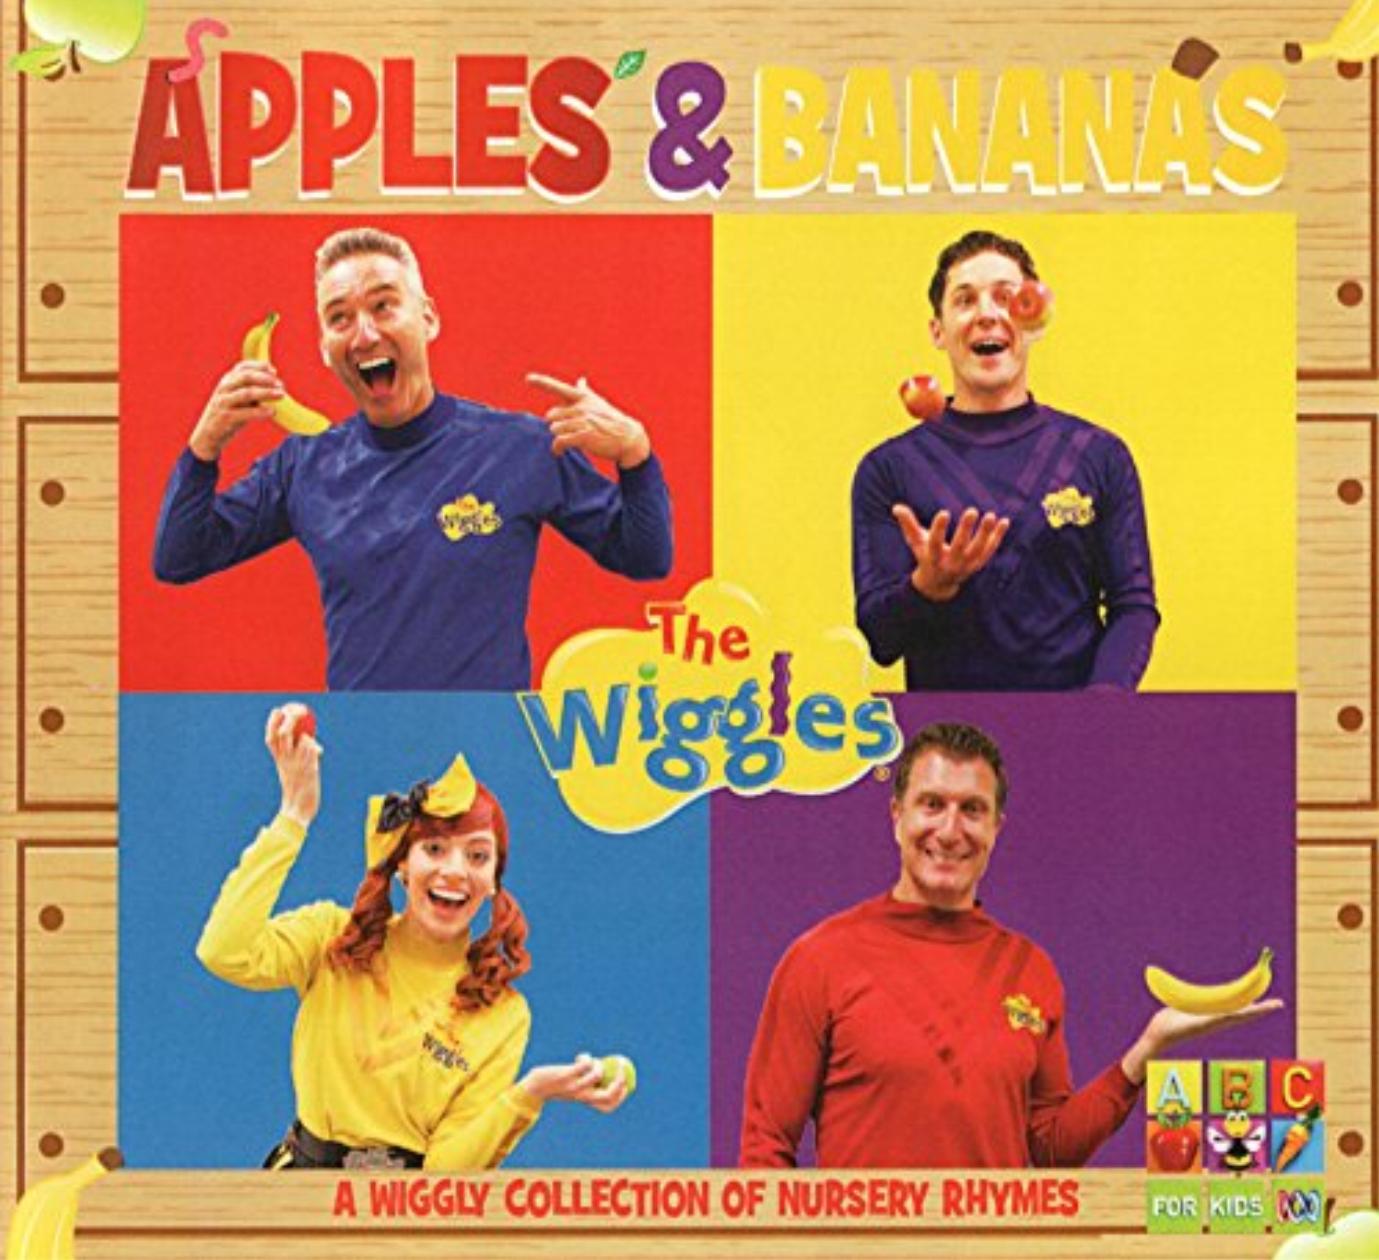 Apples & Bananas (album)